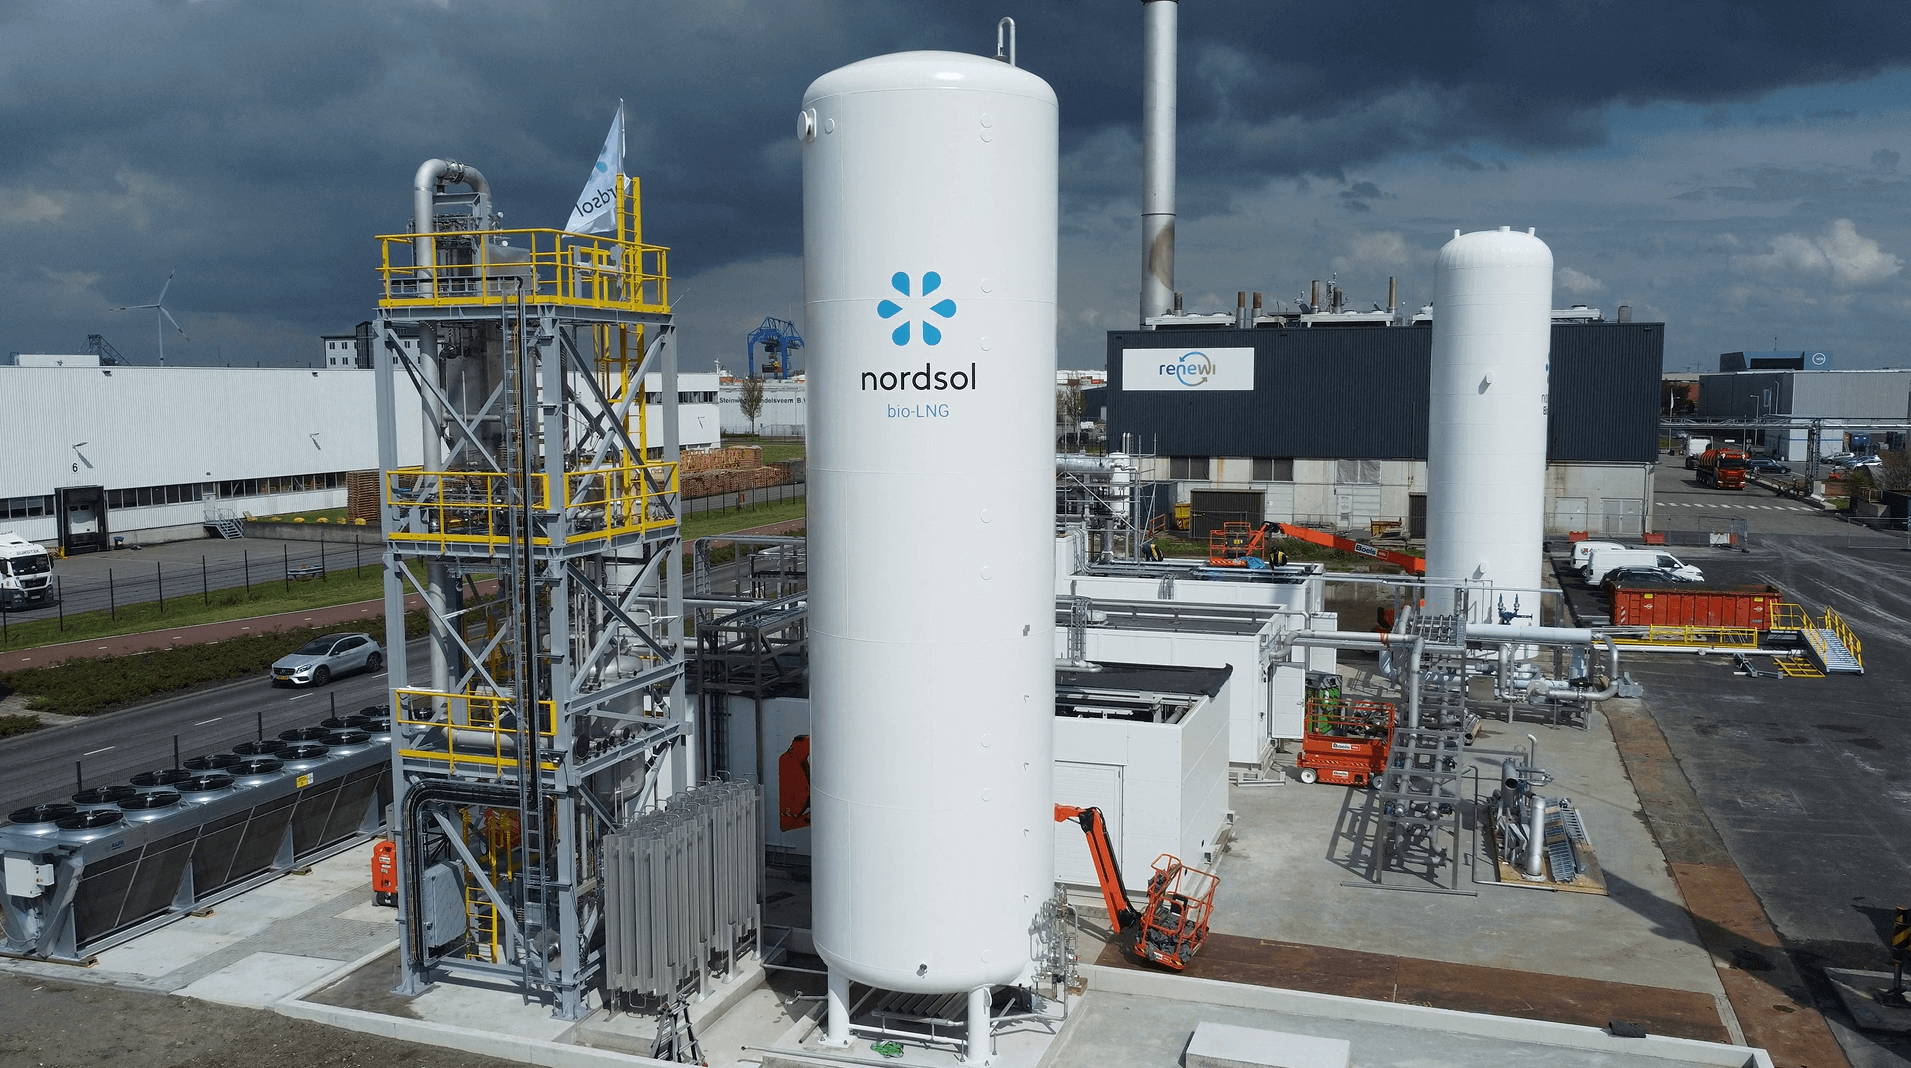 Nordsol bio-LNG in Amsterdam - under construction